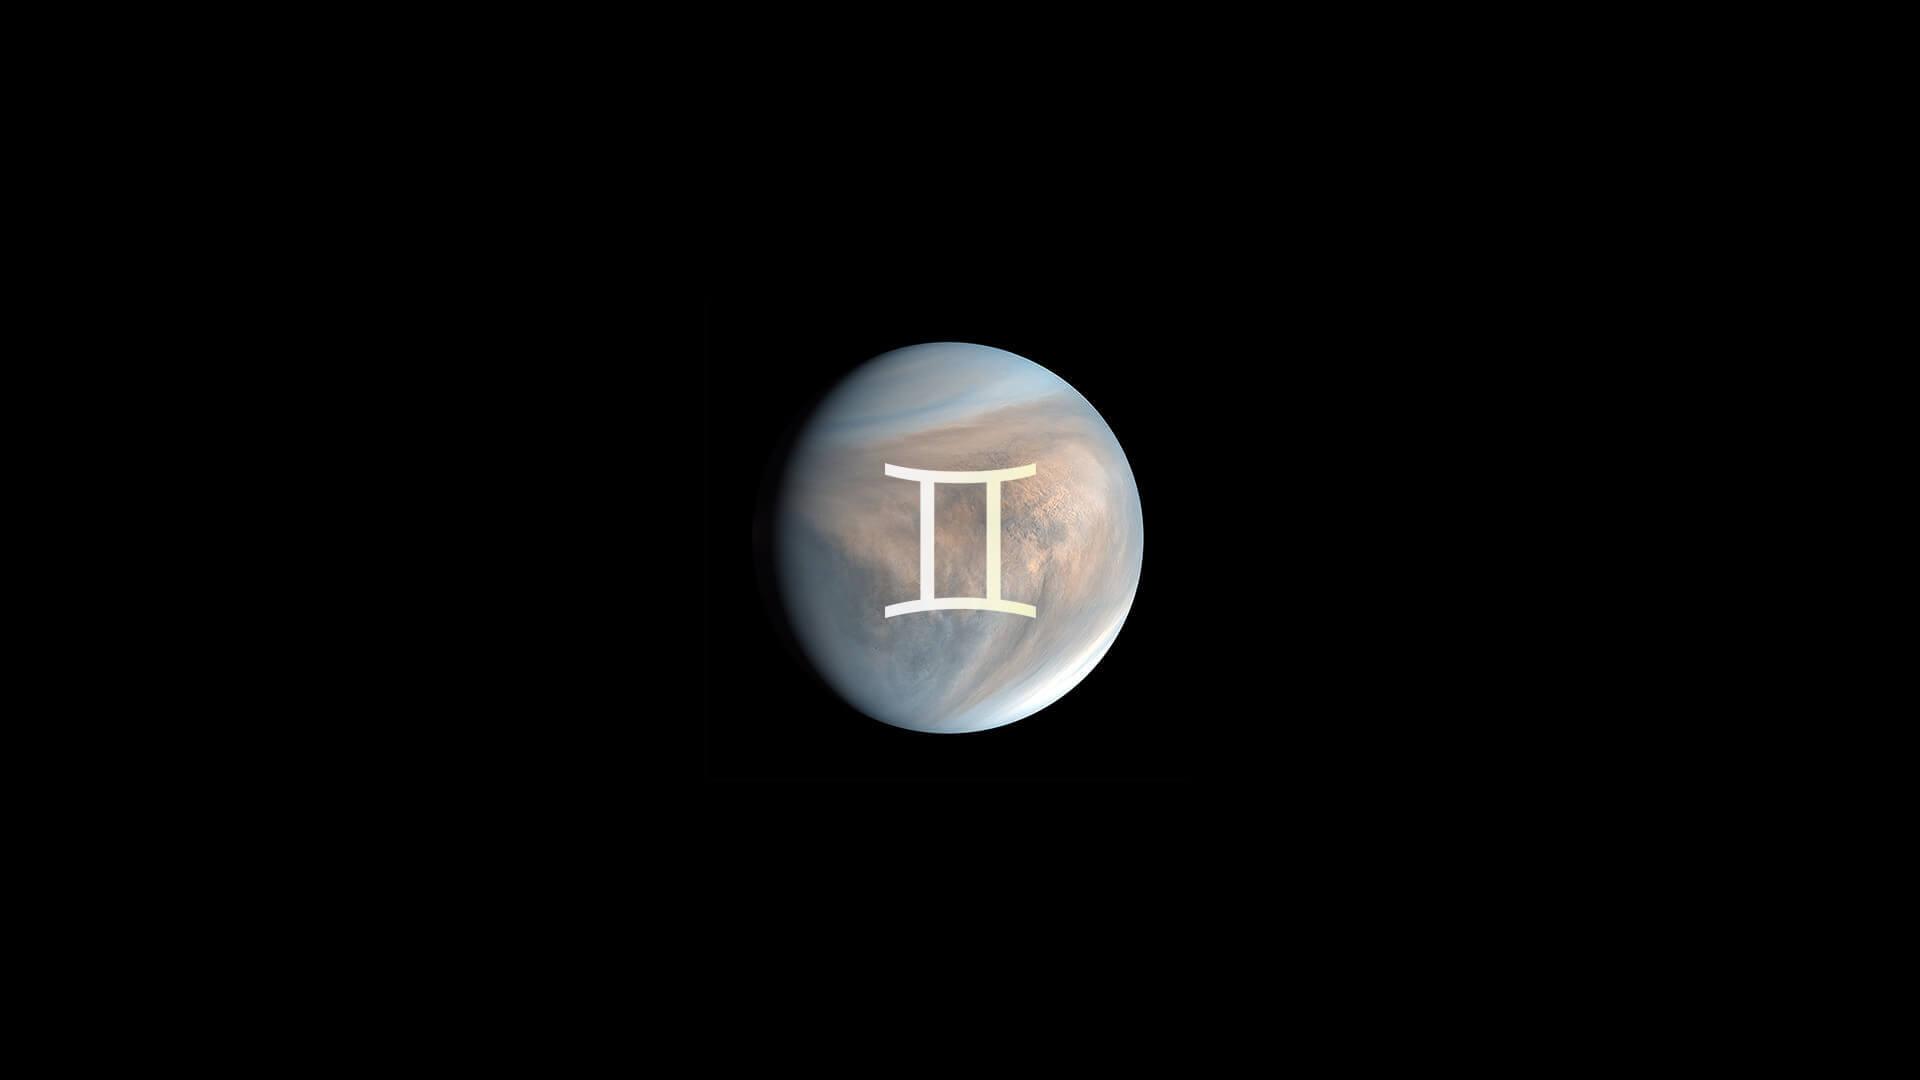 Venus enters Gemini